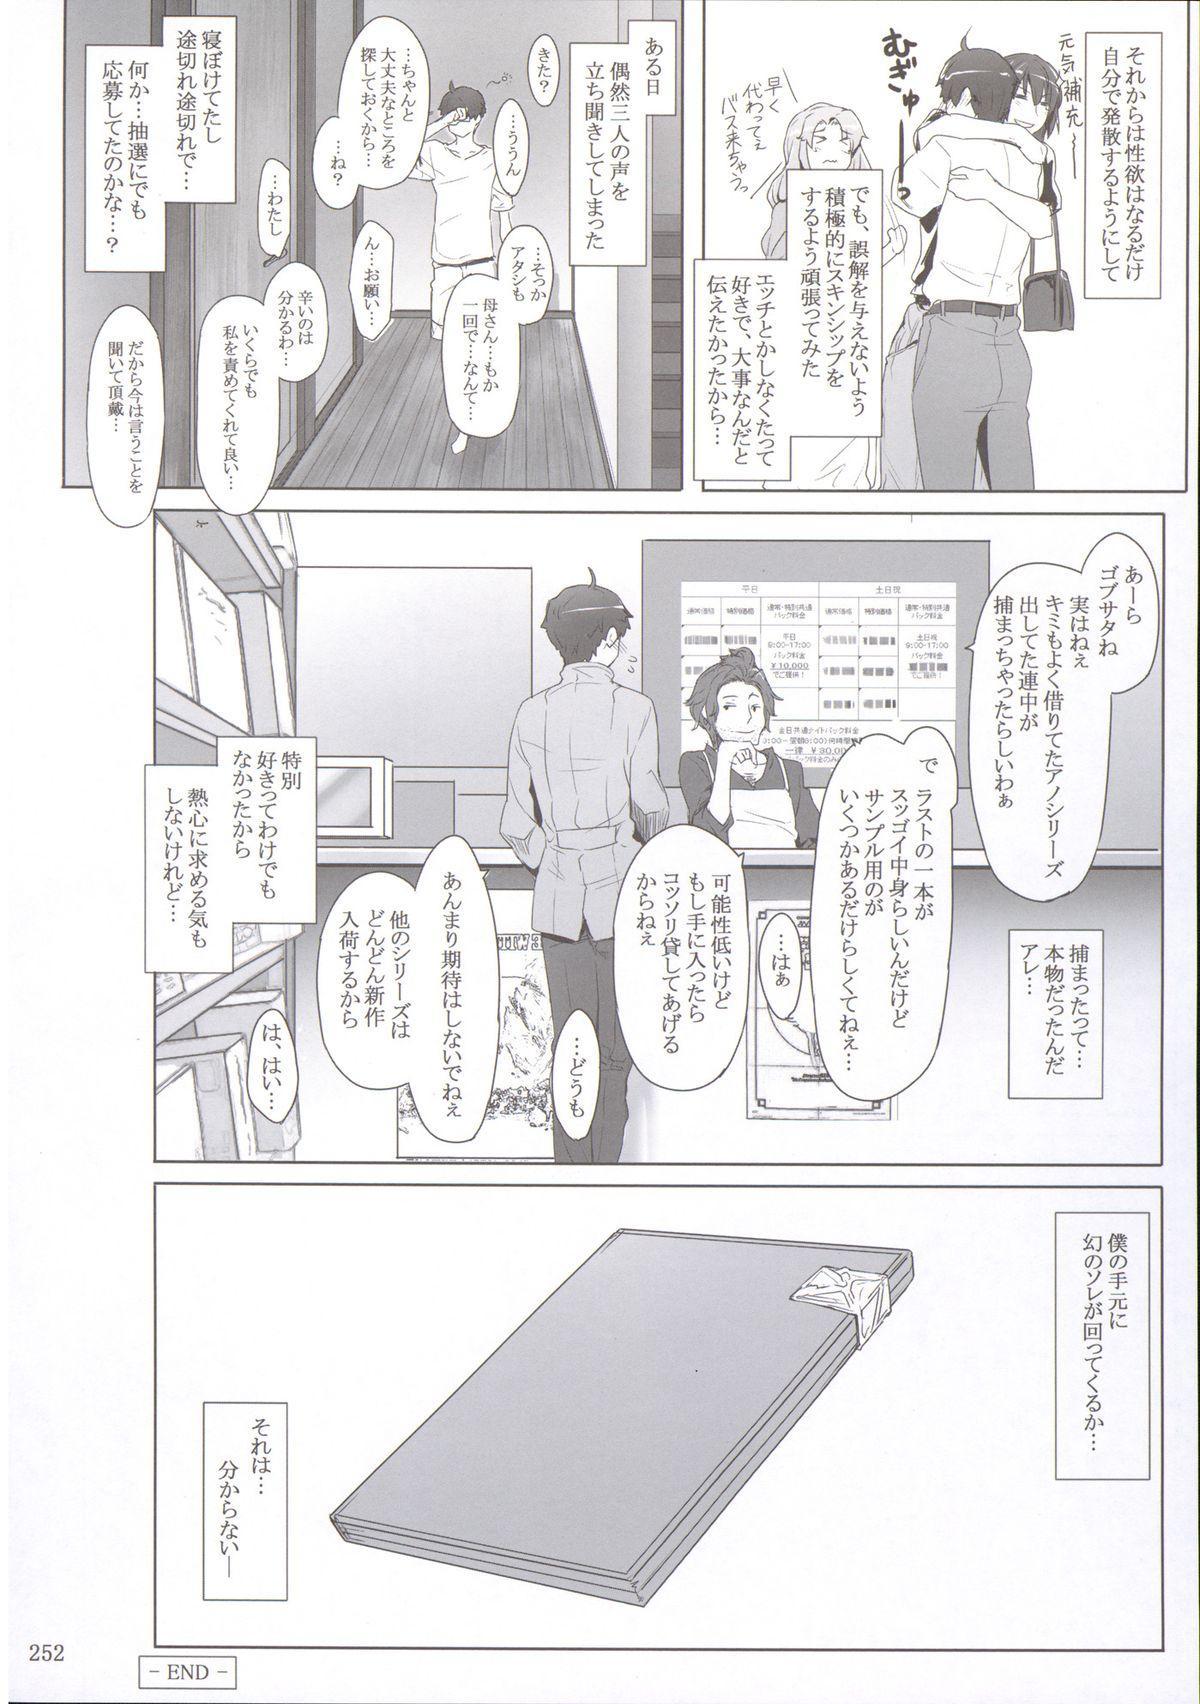 (C86) [MTSP (Jin)] Tachibana-san-chi no Dansei Jijou Matome Ban [Incomplete] 50